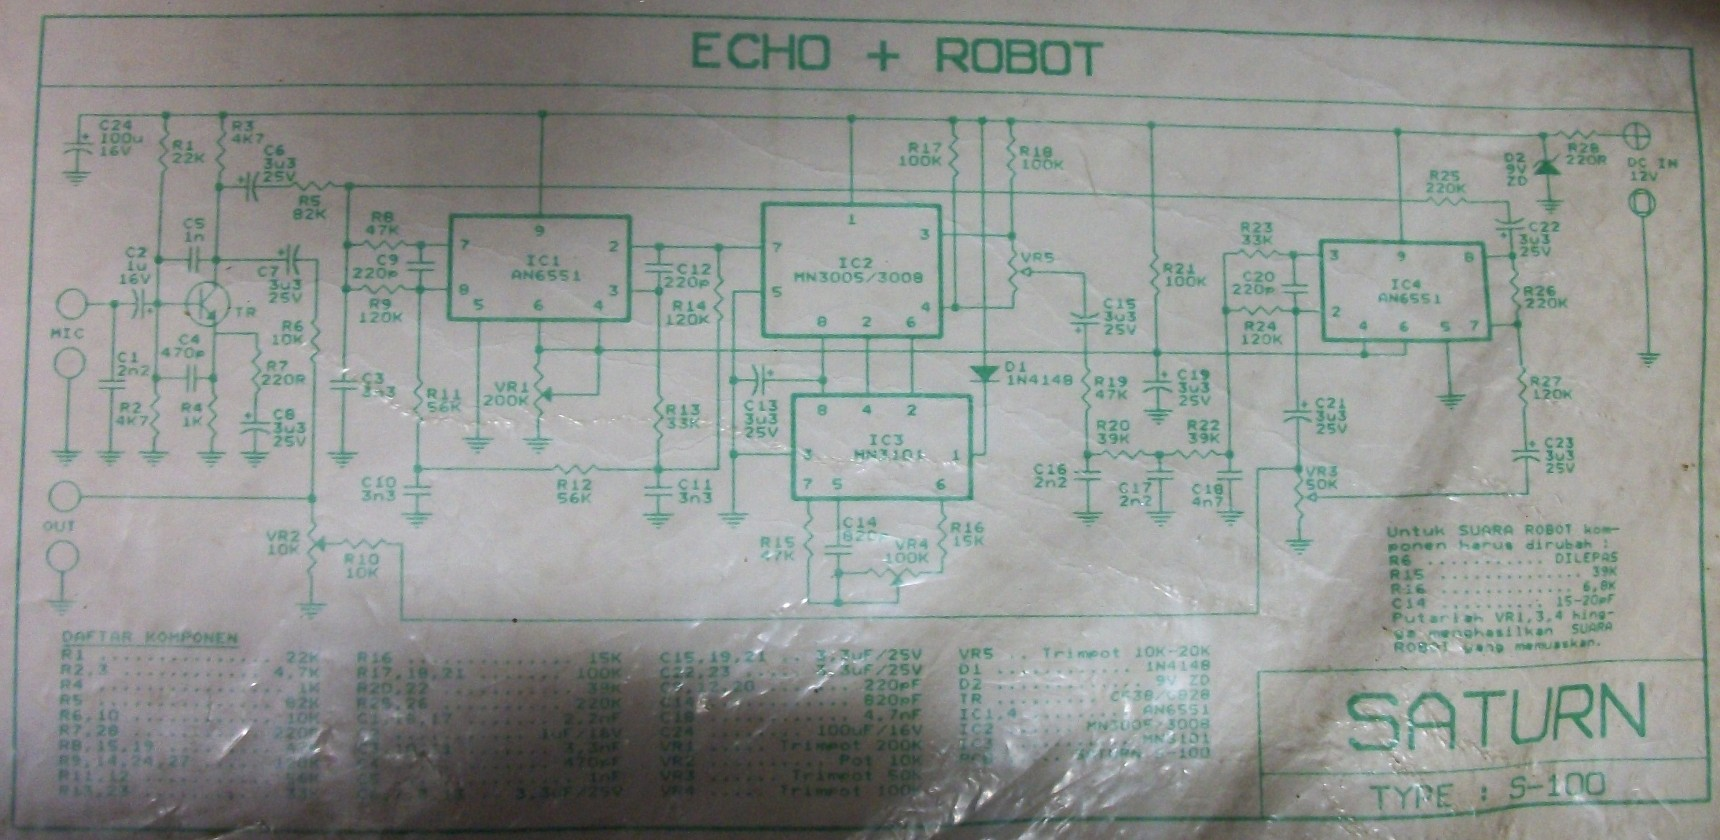 echo chamber electronic schematic diagram rh electronicscheme net